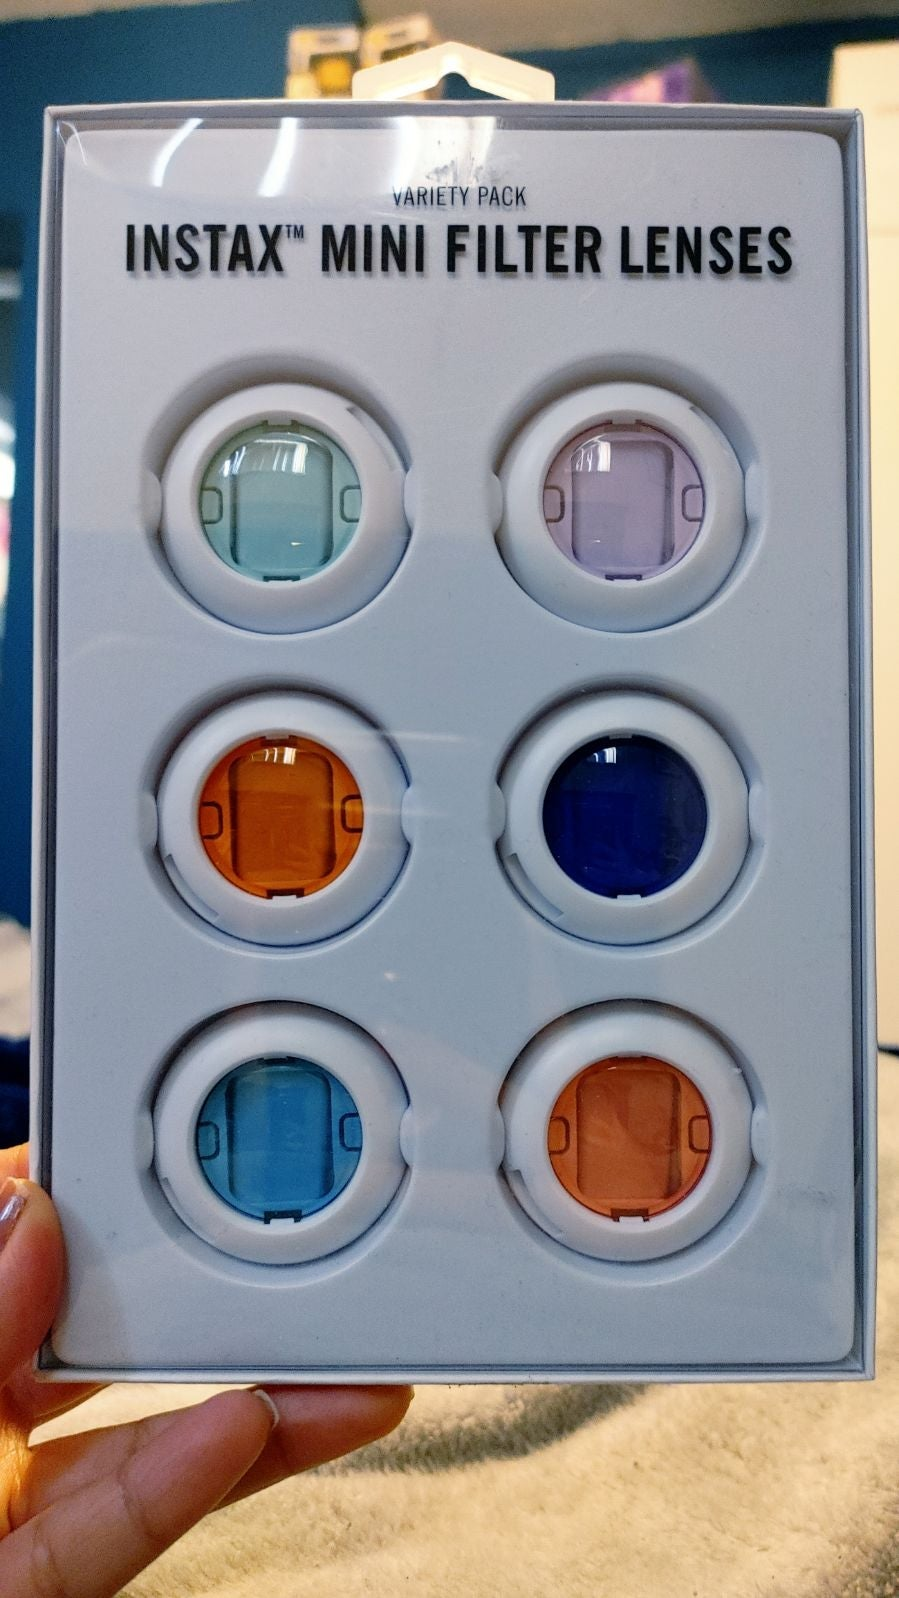 Instax mini filter lenses